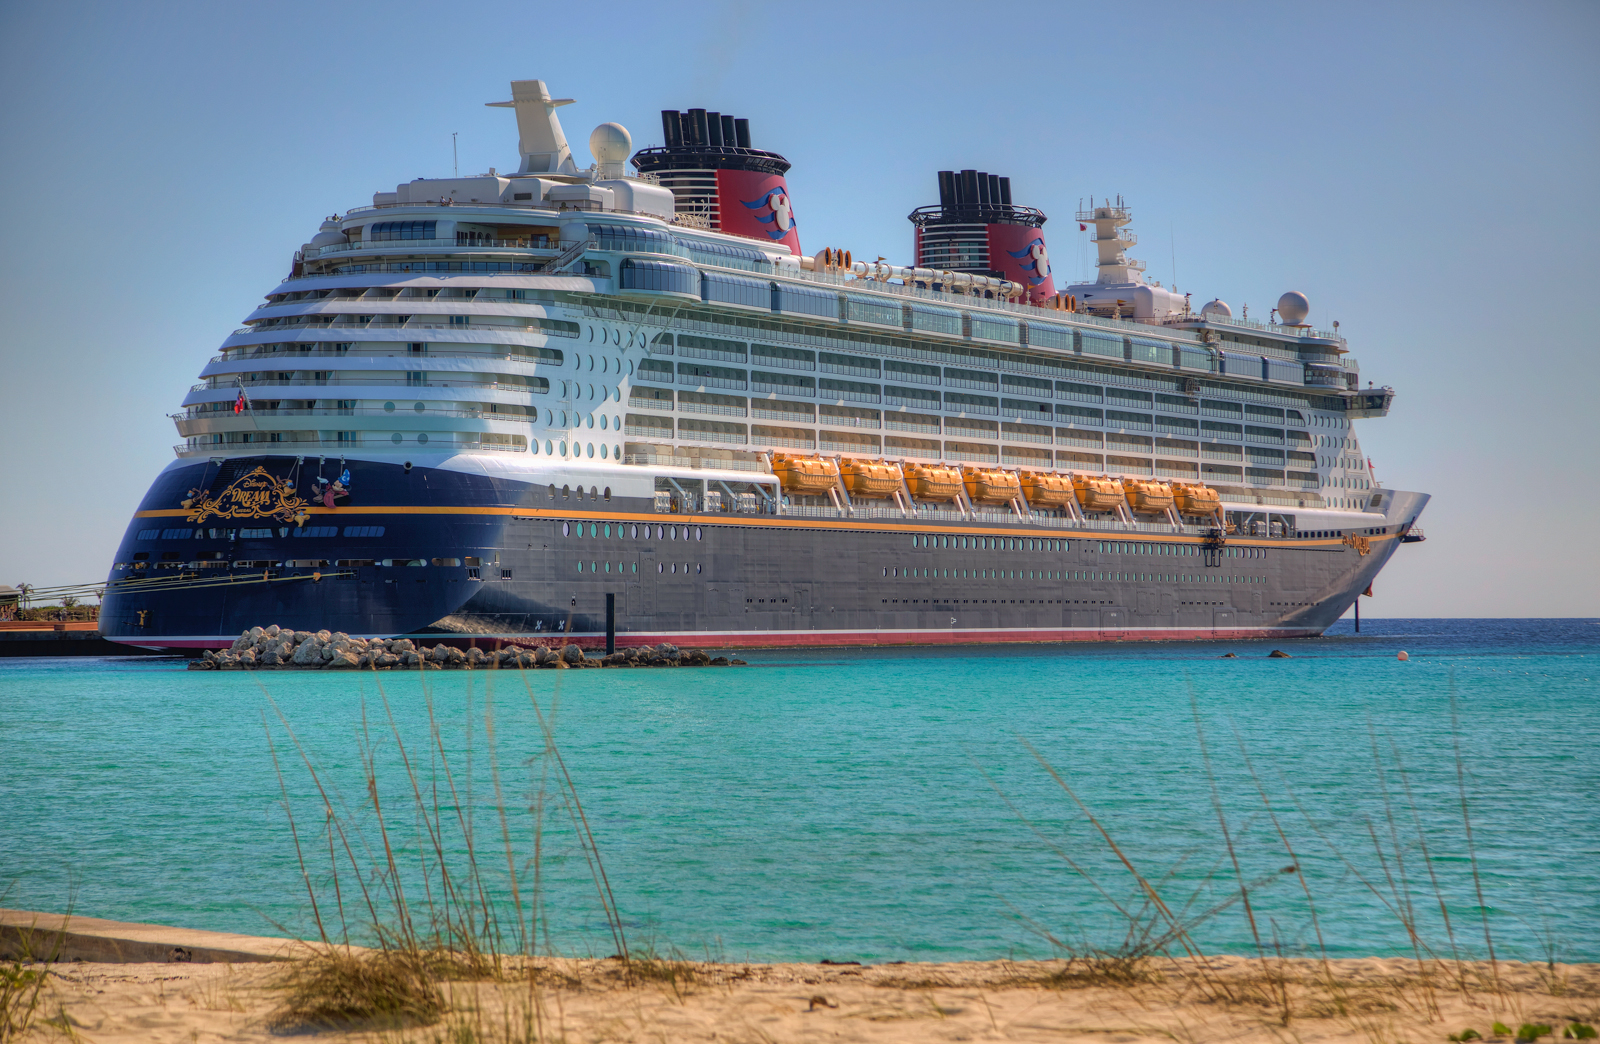 Disney Cruise Line's Castaway Cay : ThemeParkMaps |Castaway Cay Disney Cruise Line